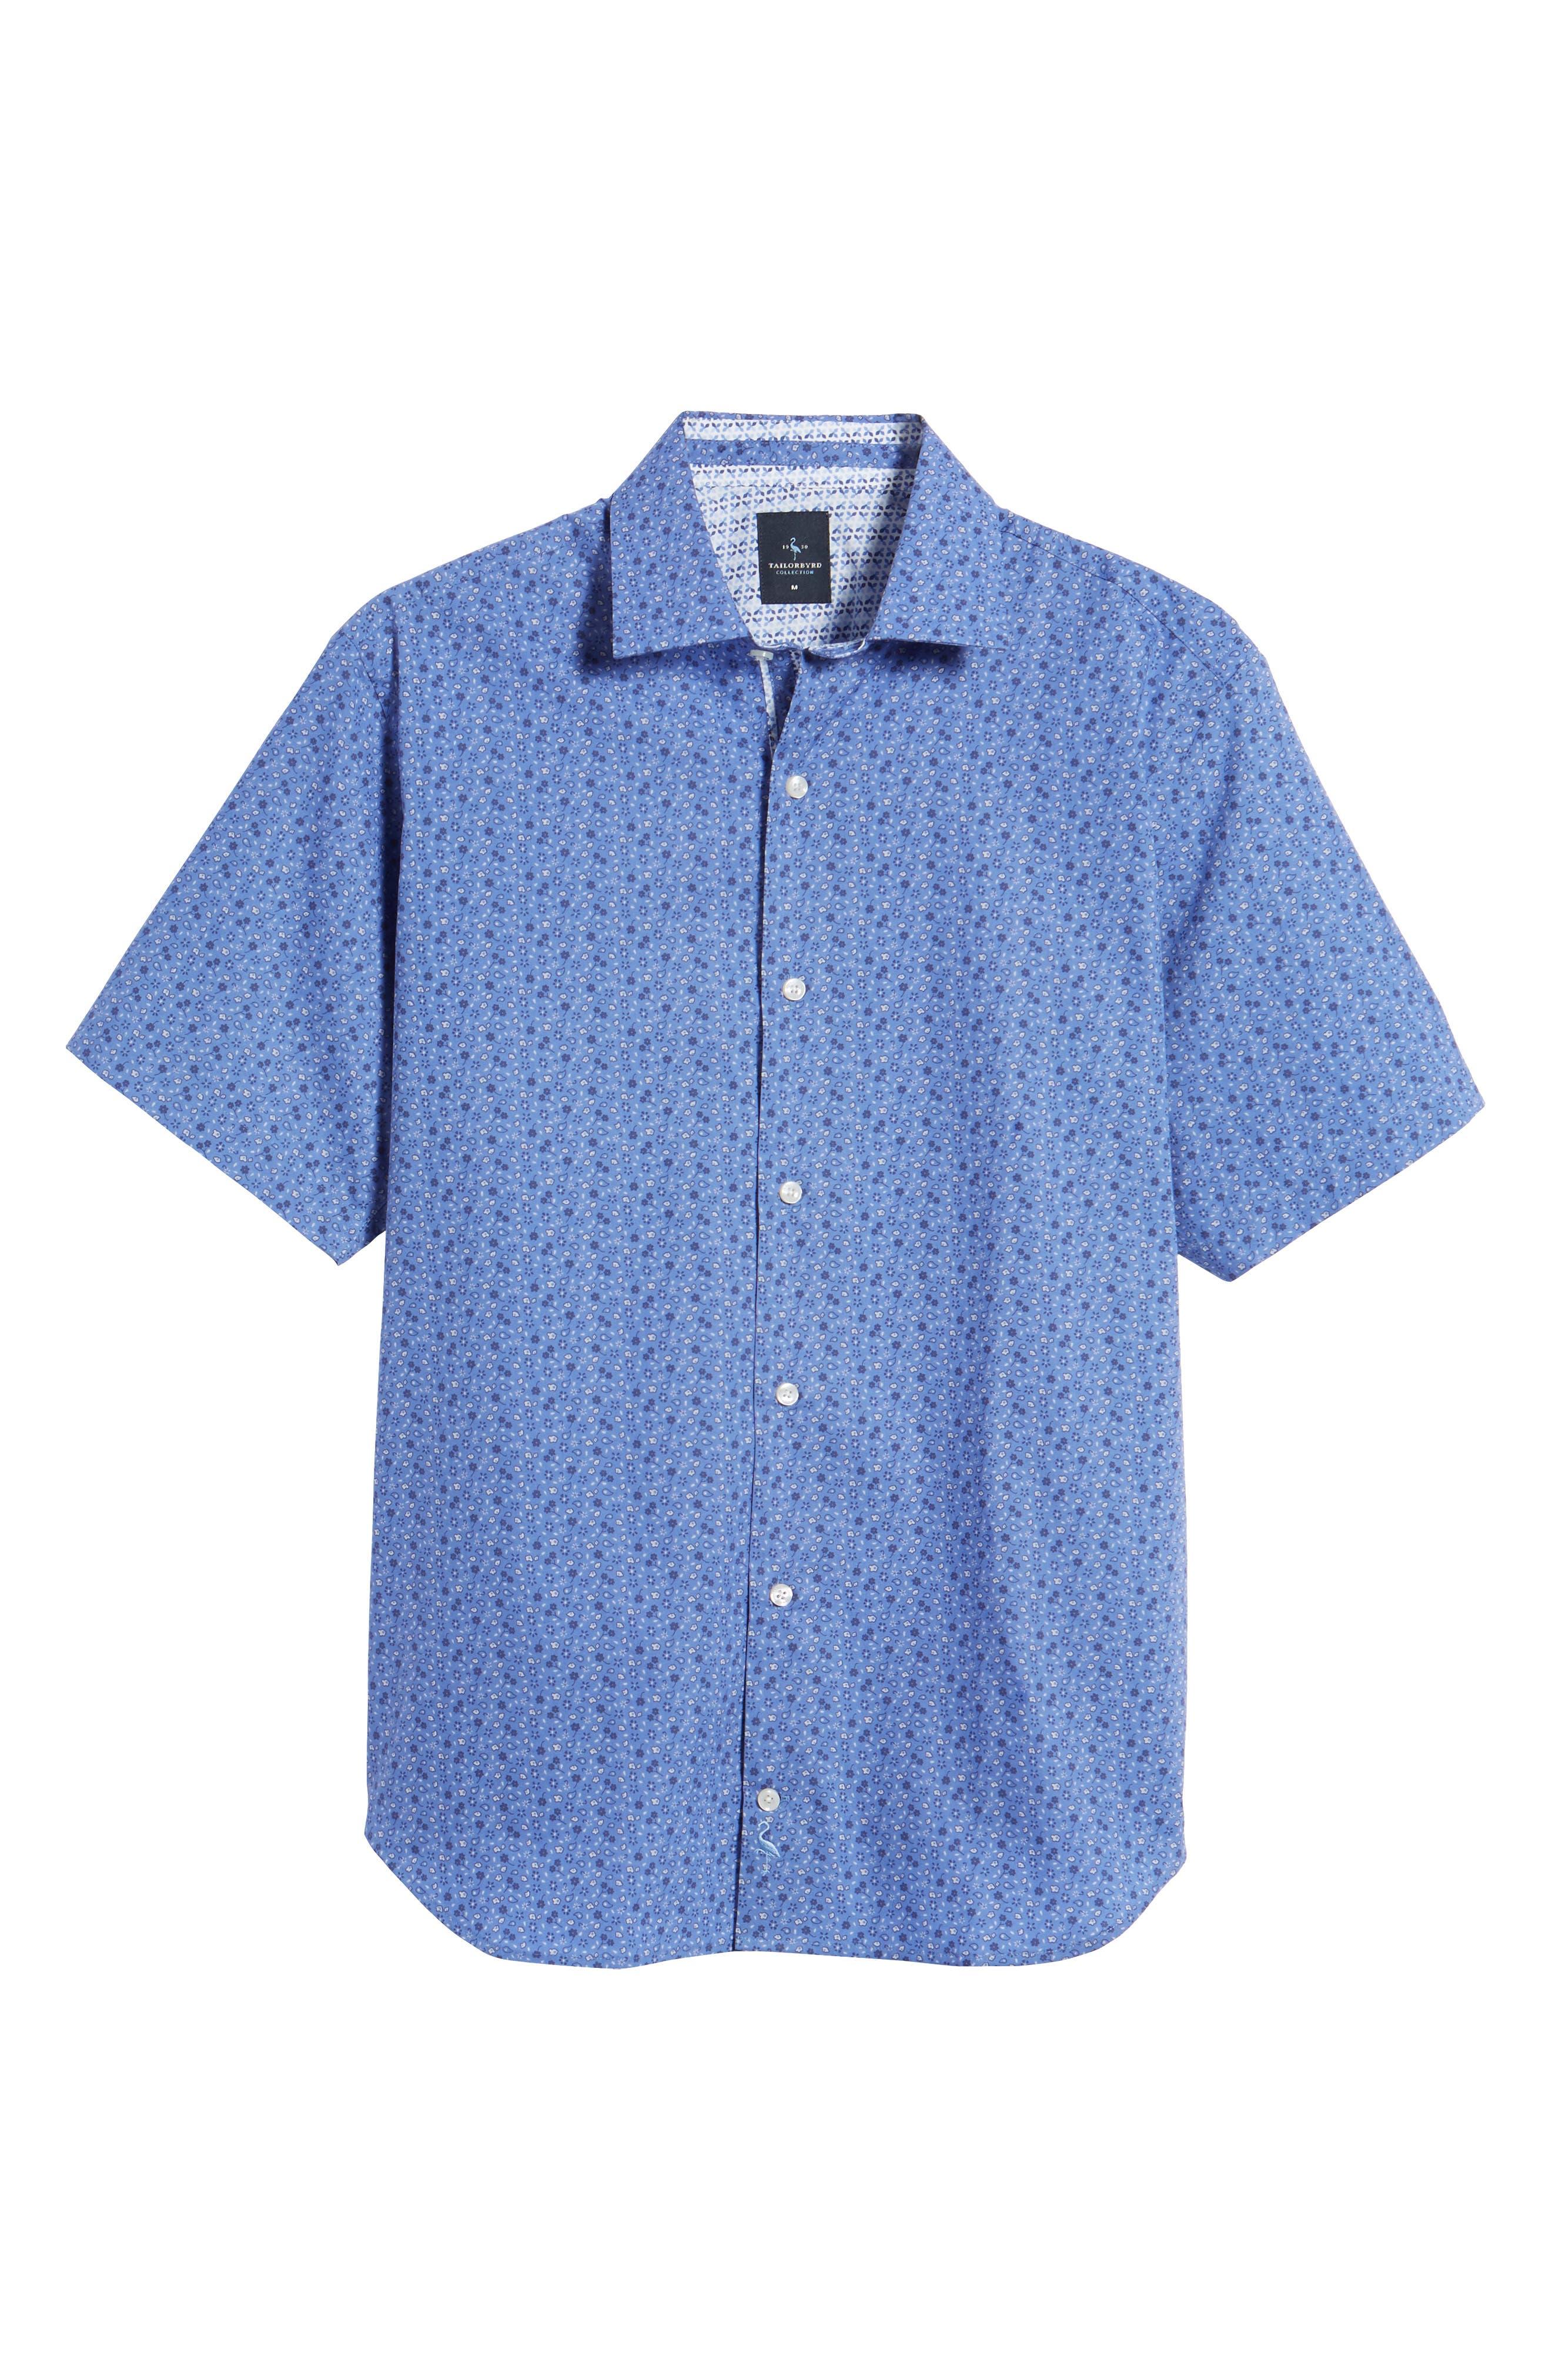 Ballou Regular Fit Floral Print Sport Shirt,                             Alternate thumbnail 6, color,                             430